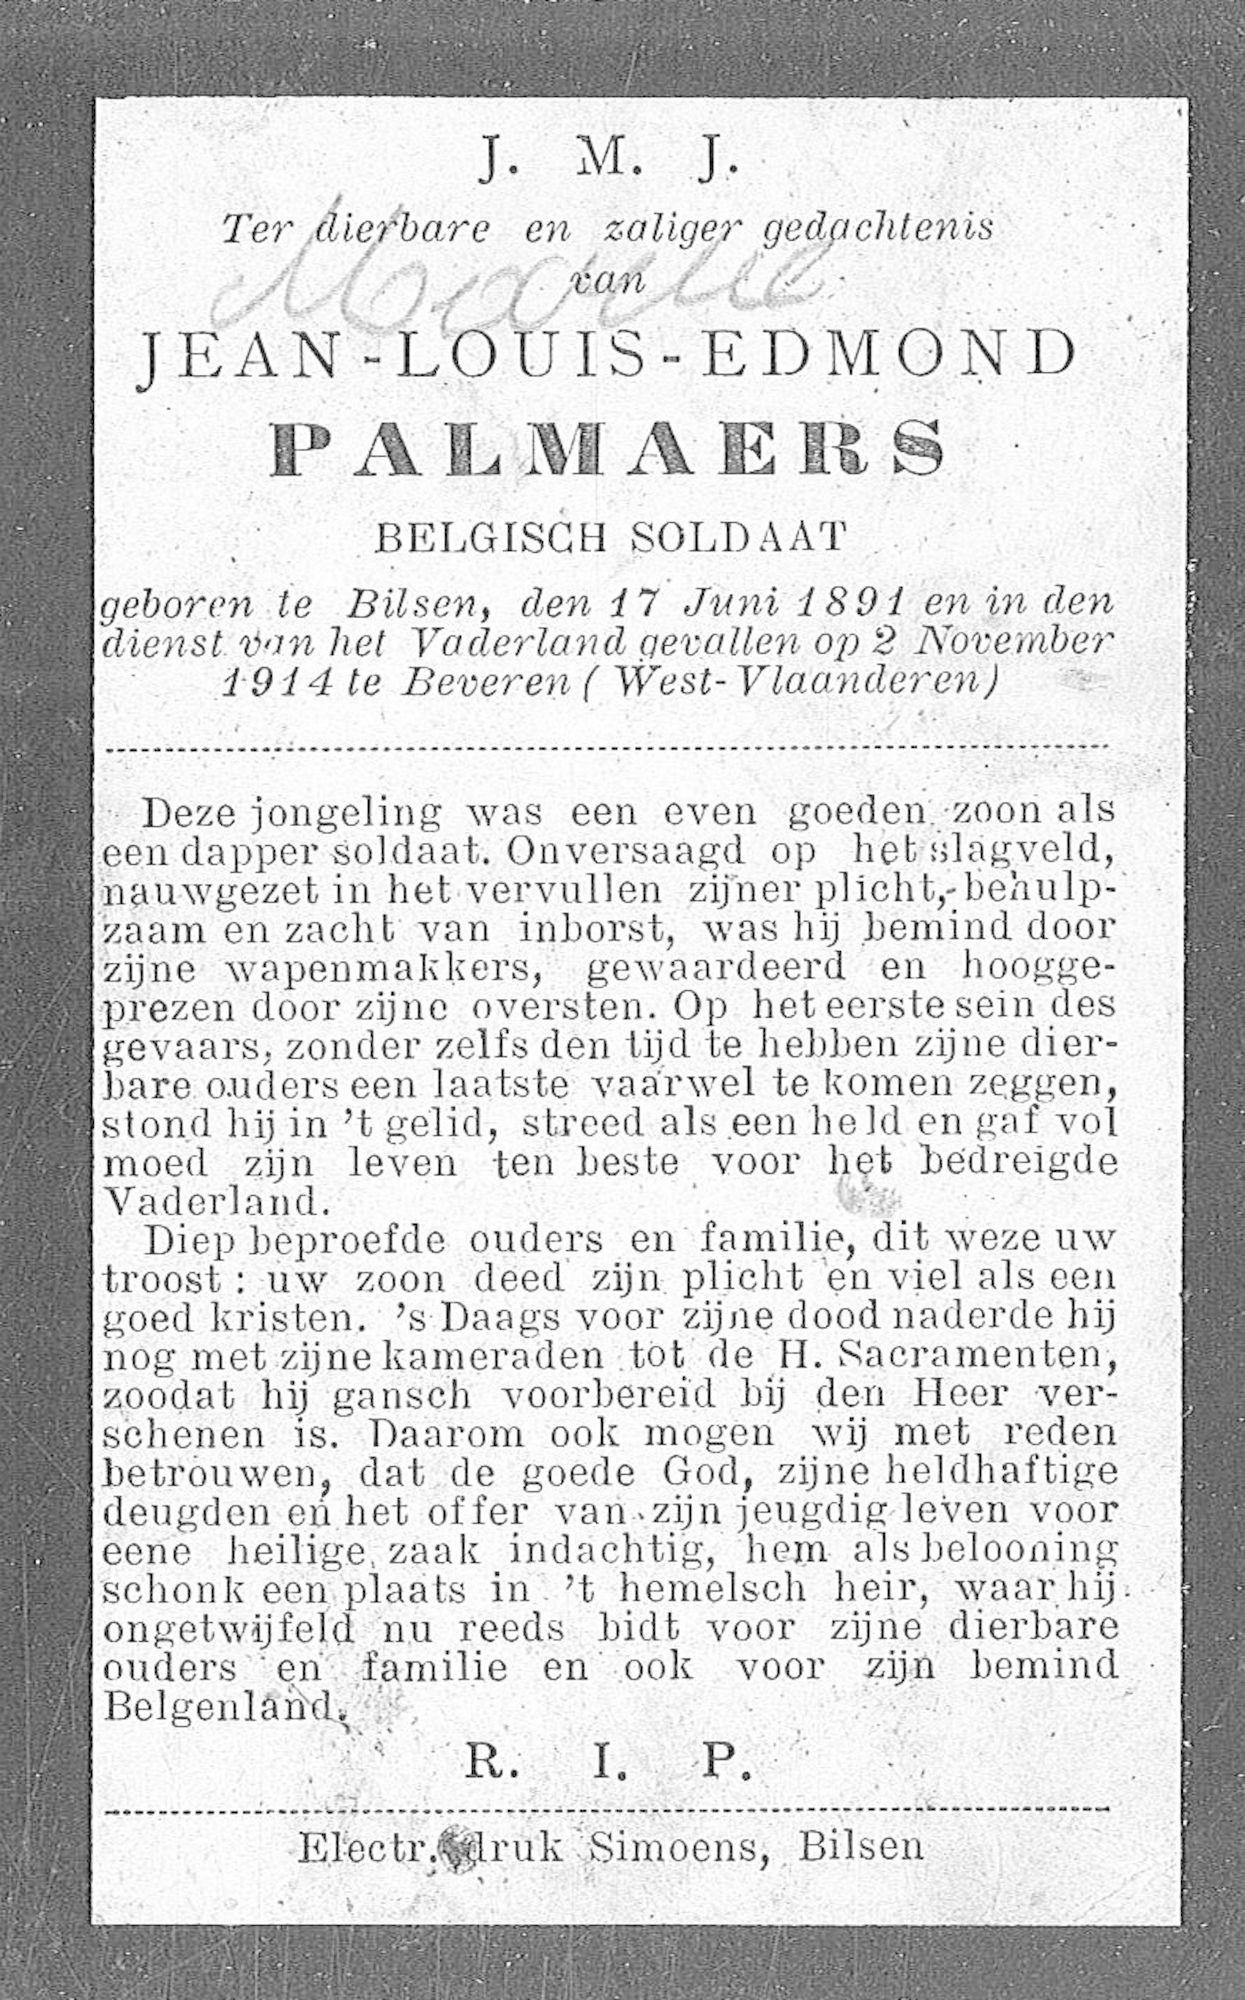 Jean-Louis-Edmond Palmaers